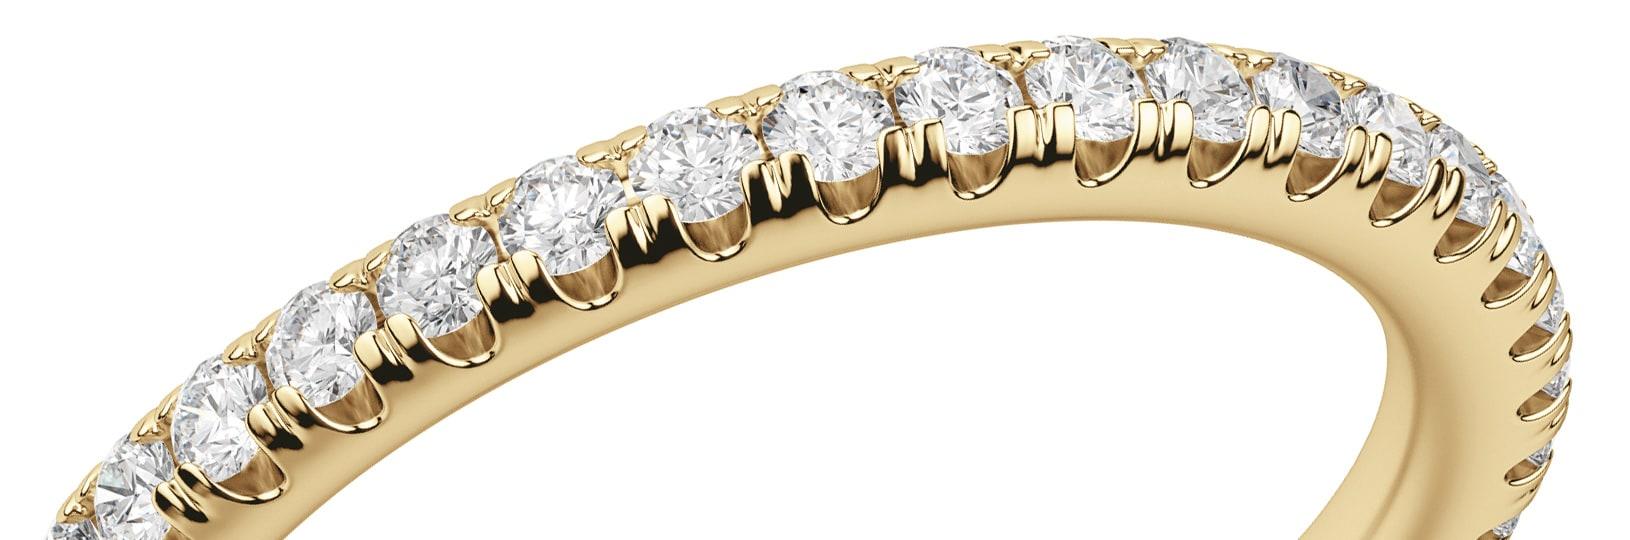 U-cut pave diamonds